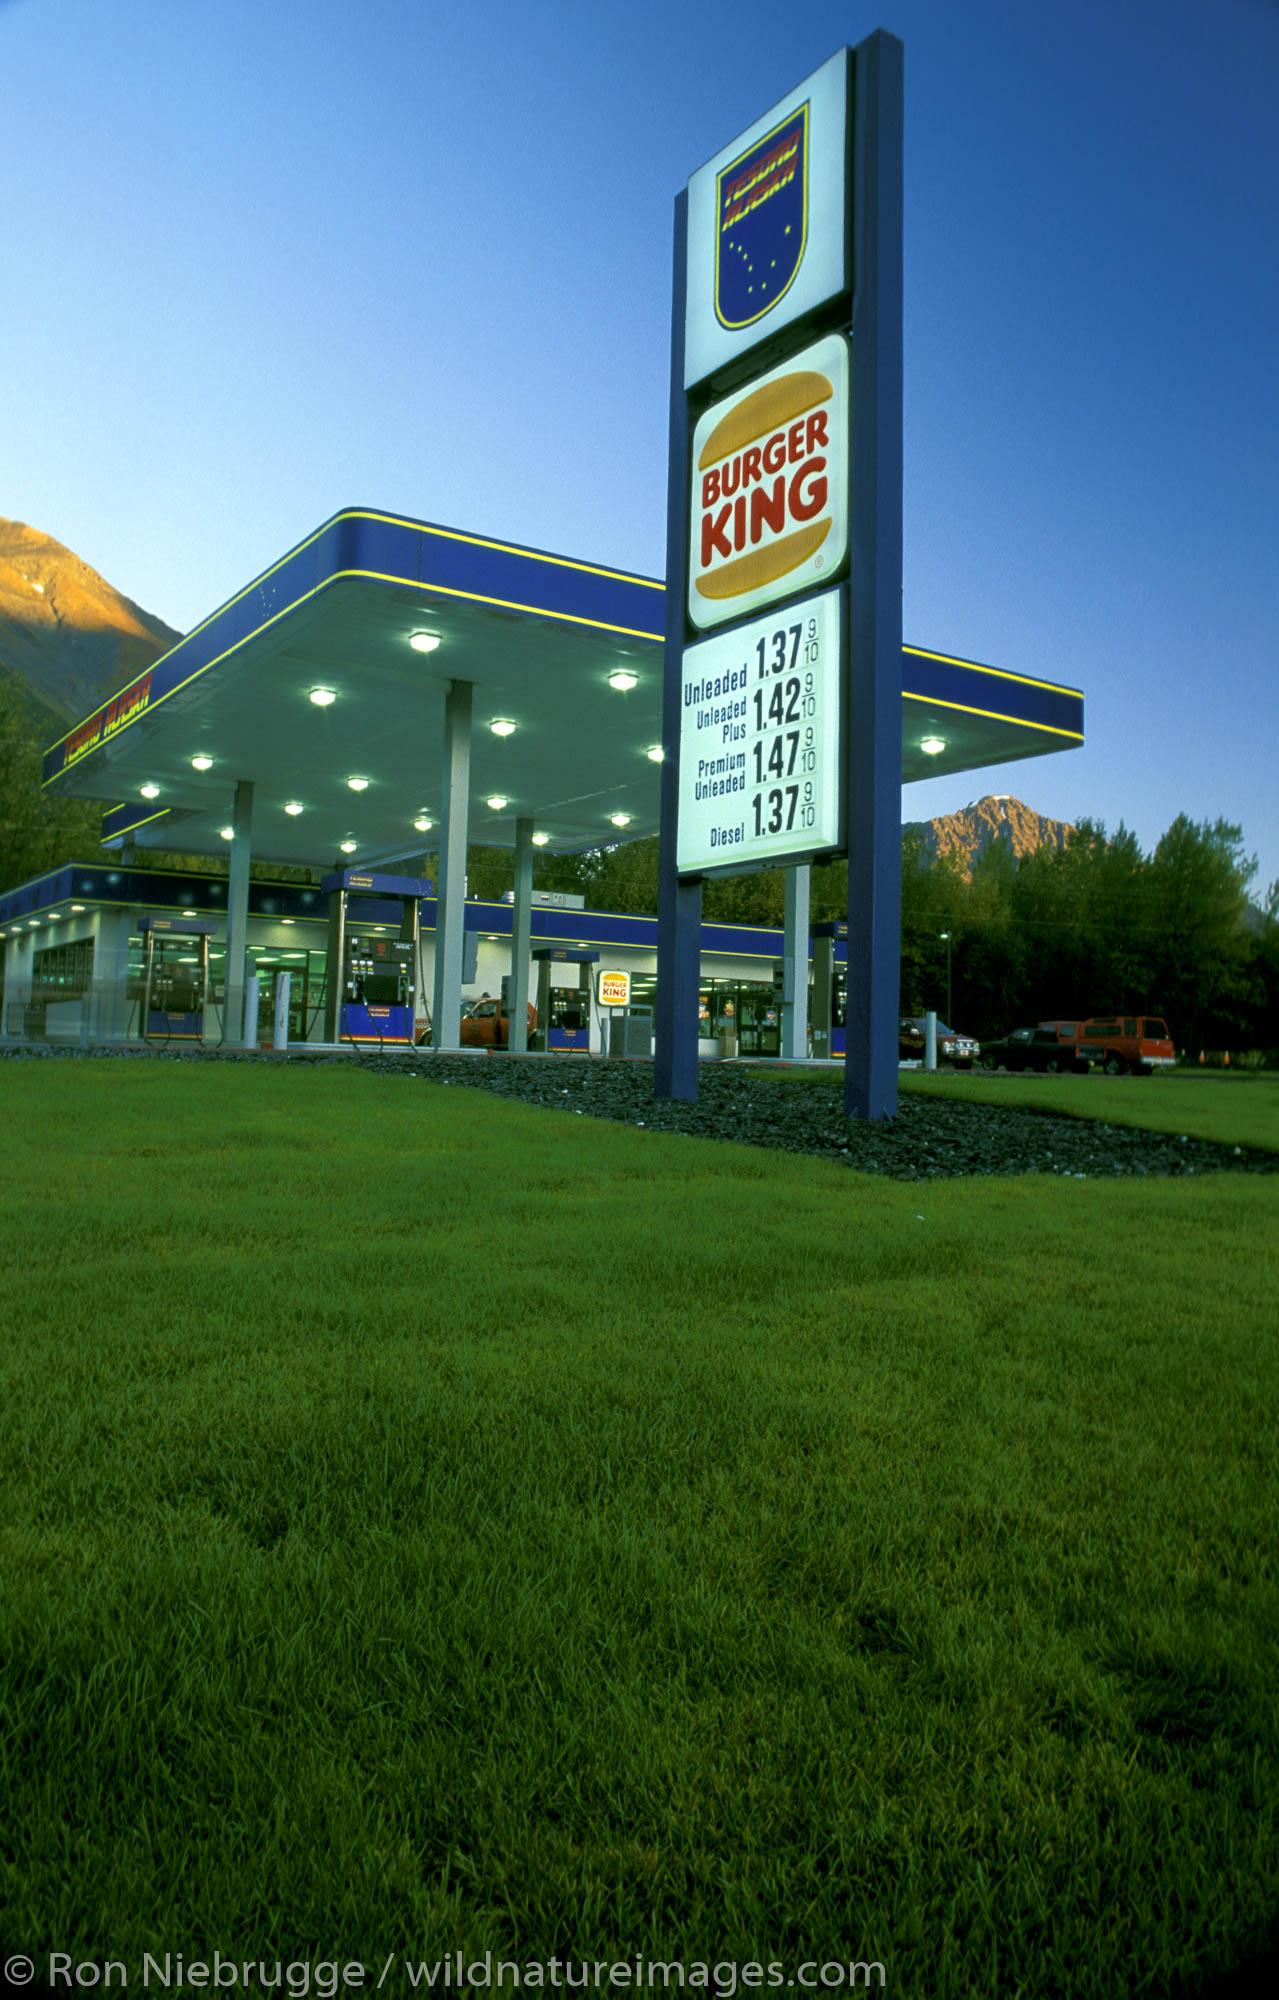 Service Station, Seward, Alaska.